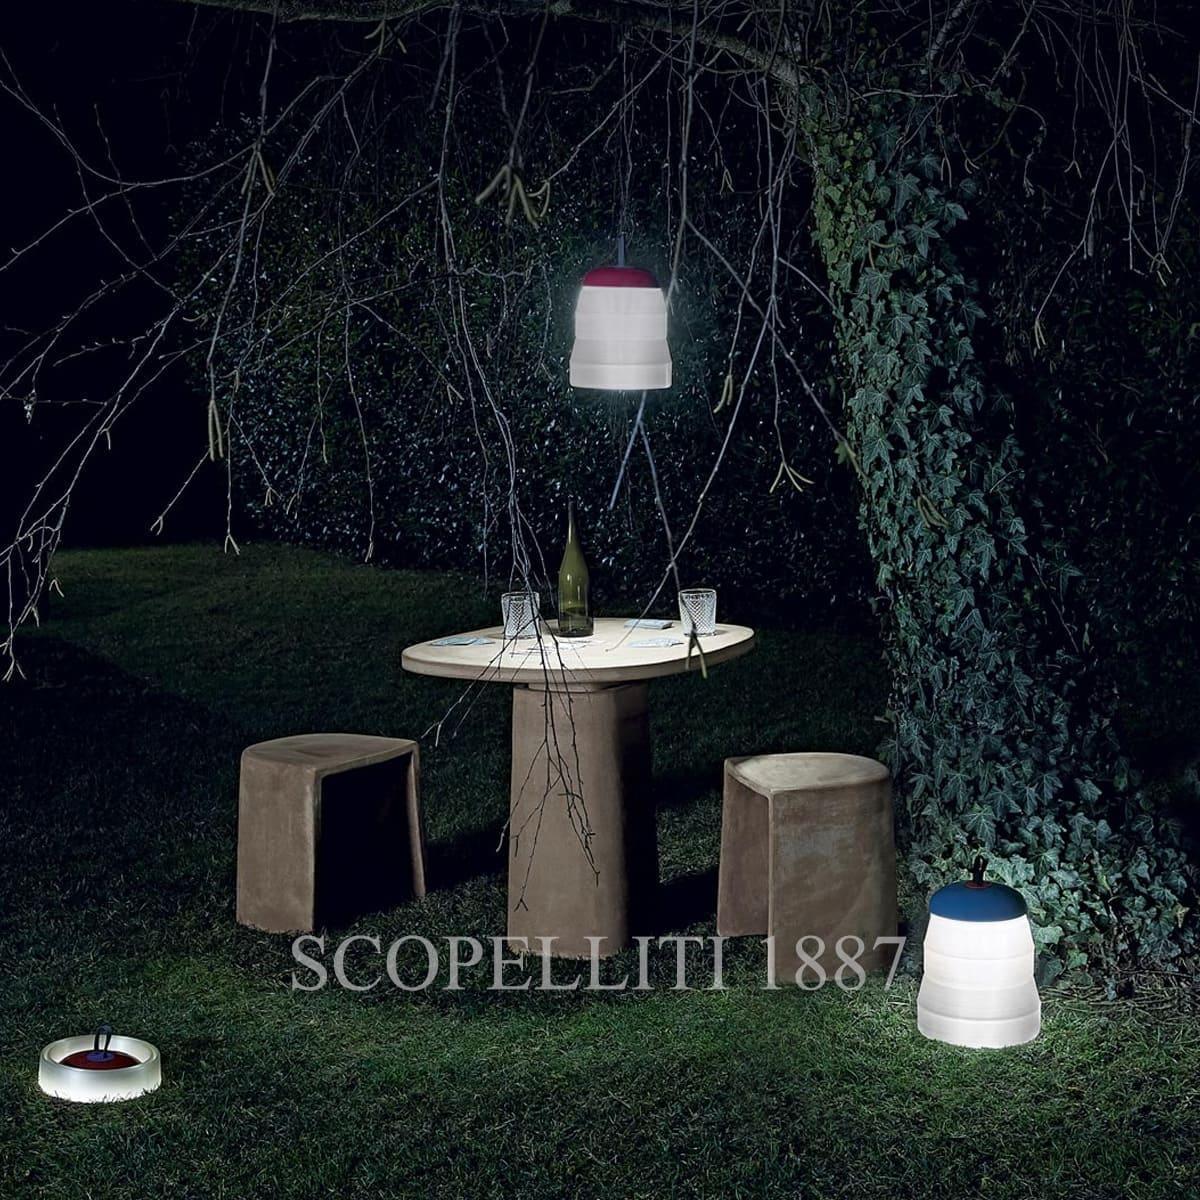 foscarini italian lighting designer table lamp cri cri outdoor